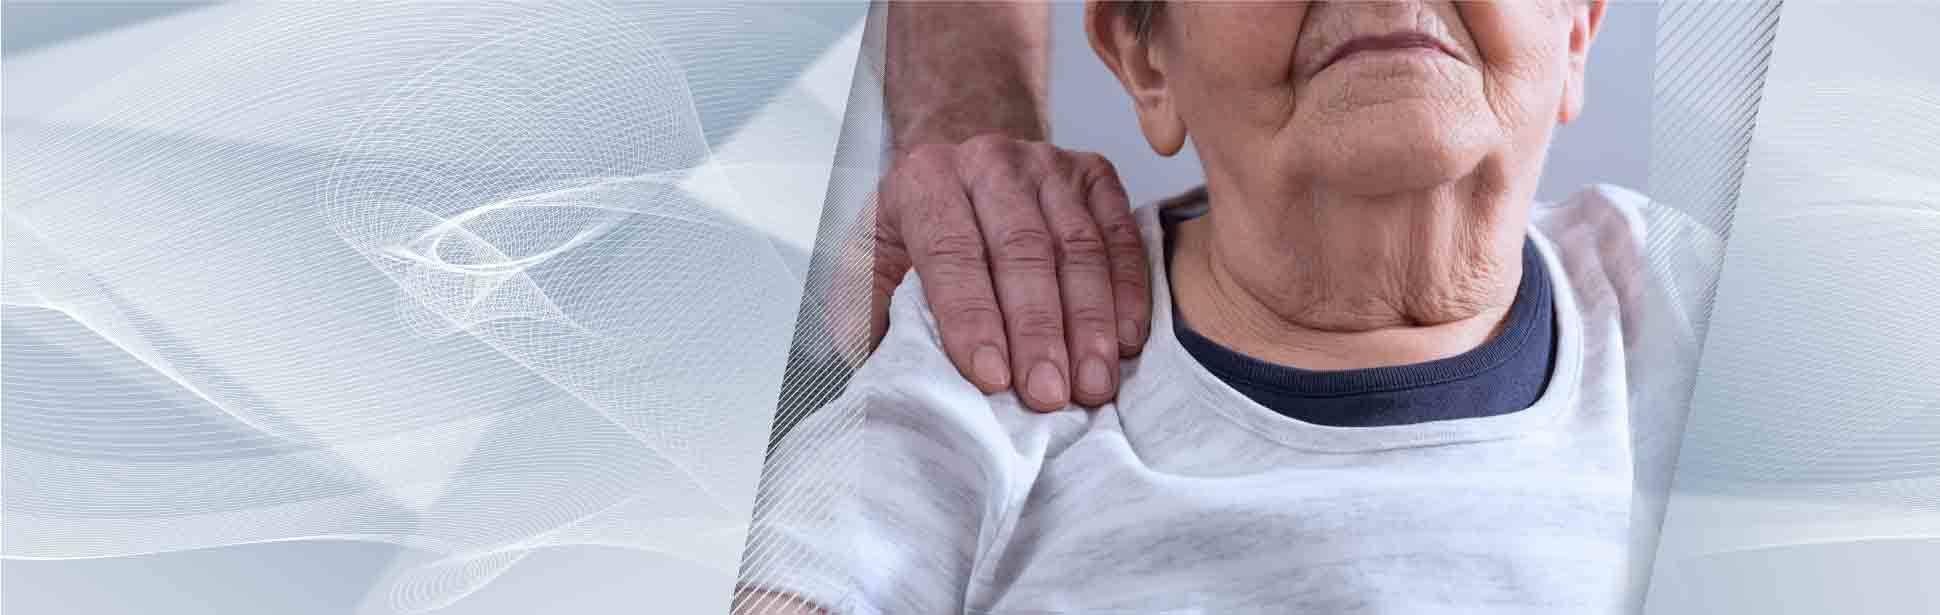 Adult day care caregiver with reassuring hand on seniors shoulder